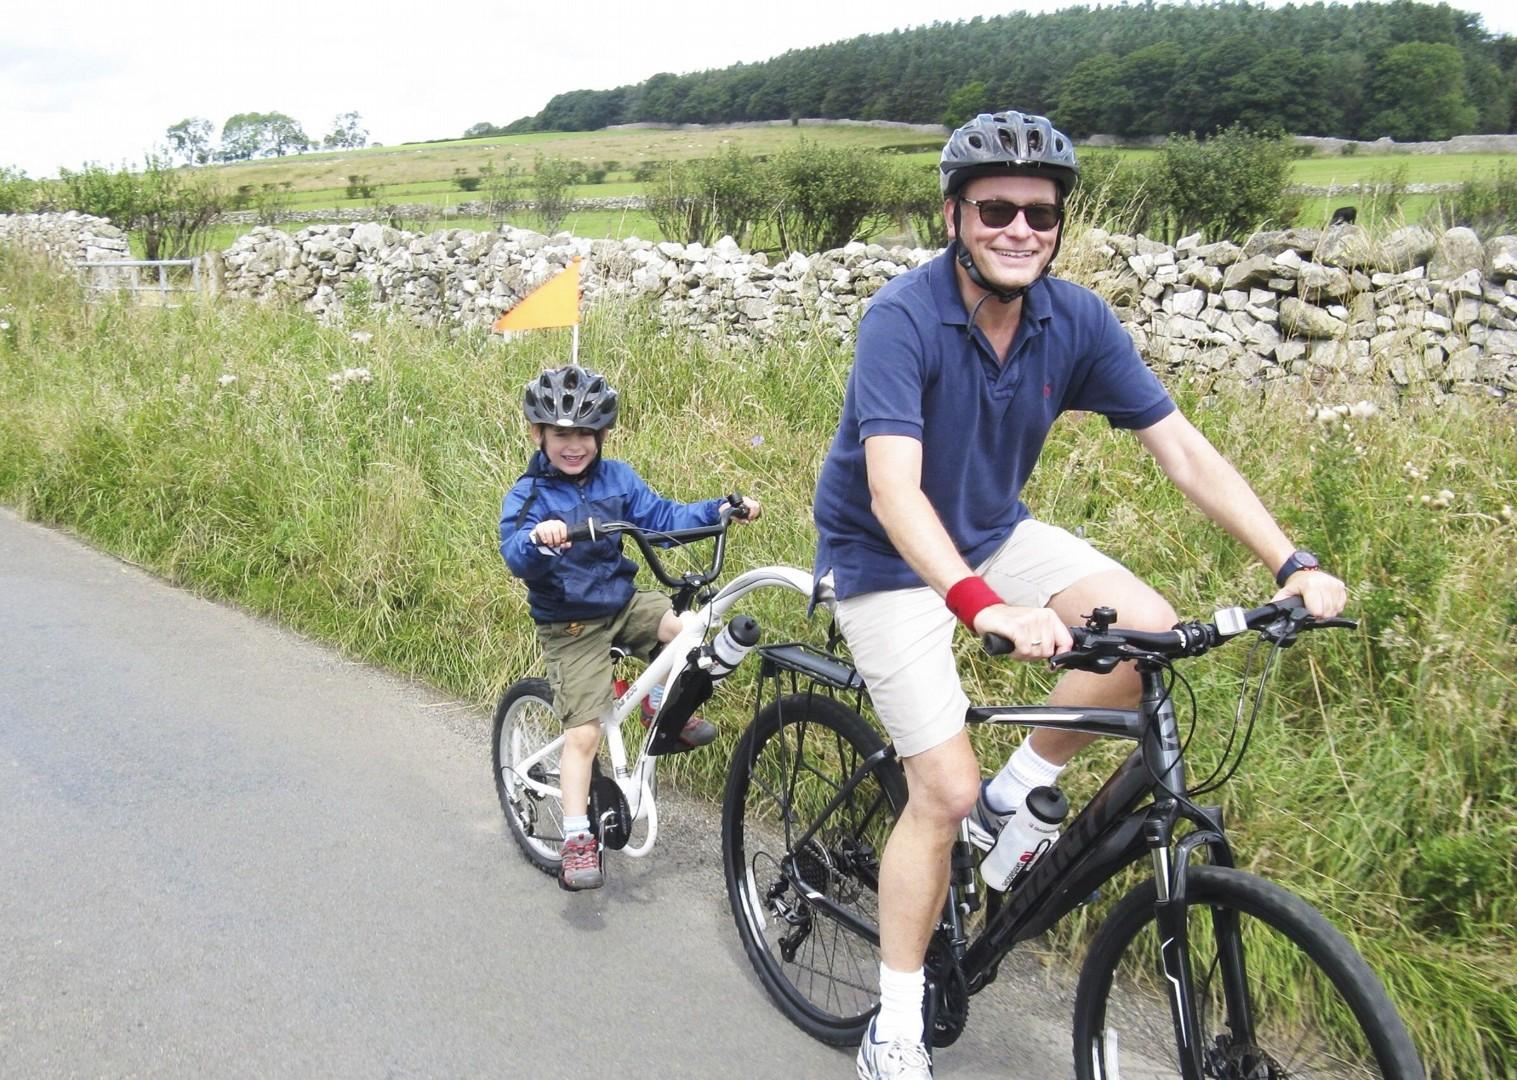 family-bike-skills-weekend-lake-district-uk.jpg - UK - Lake District - Guided Family Bike Skills - Family Cycling